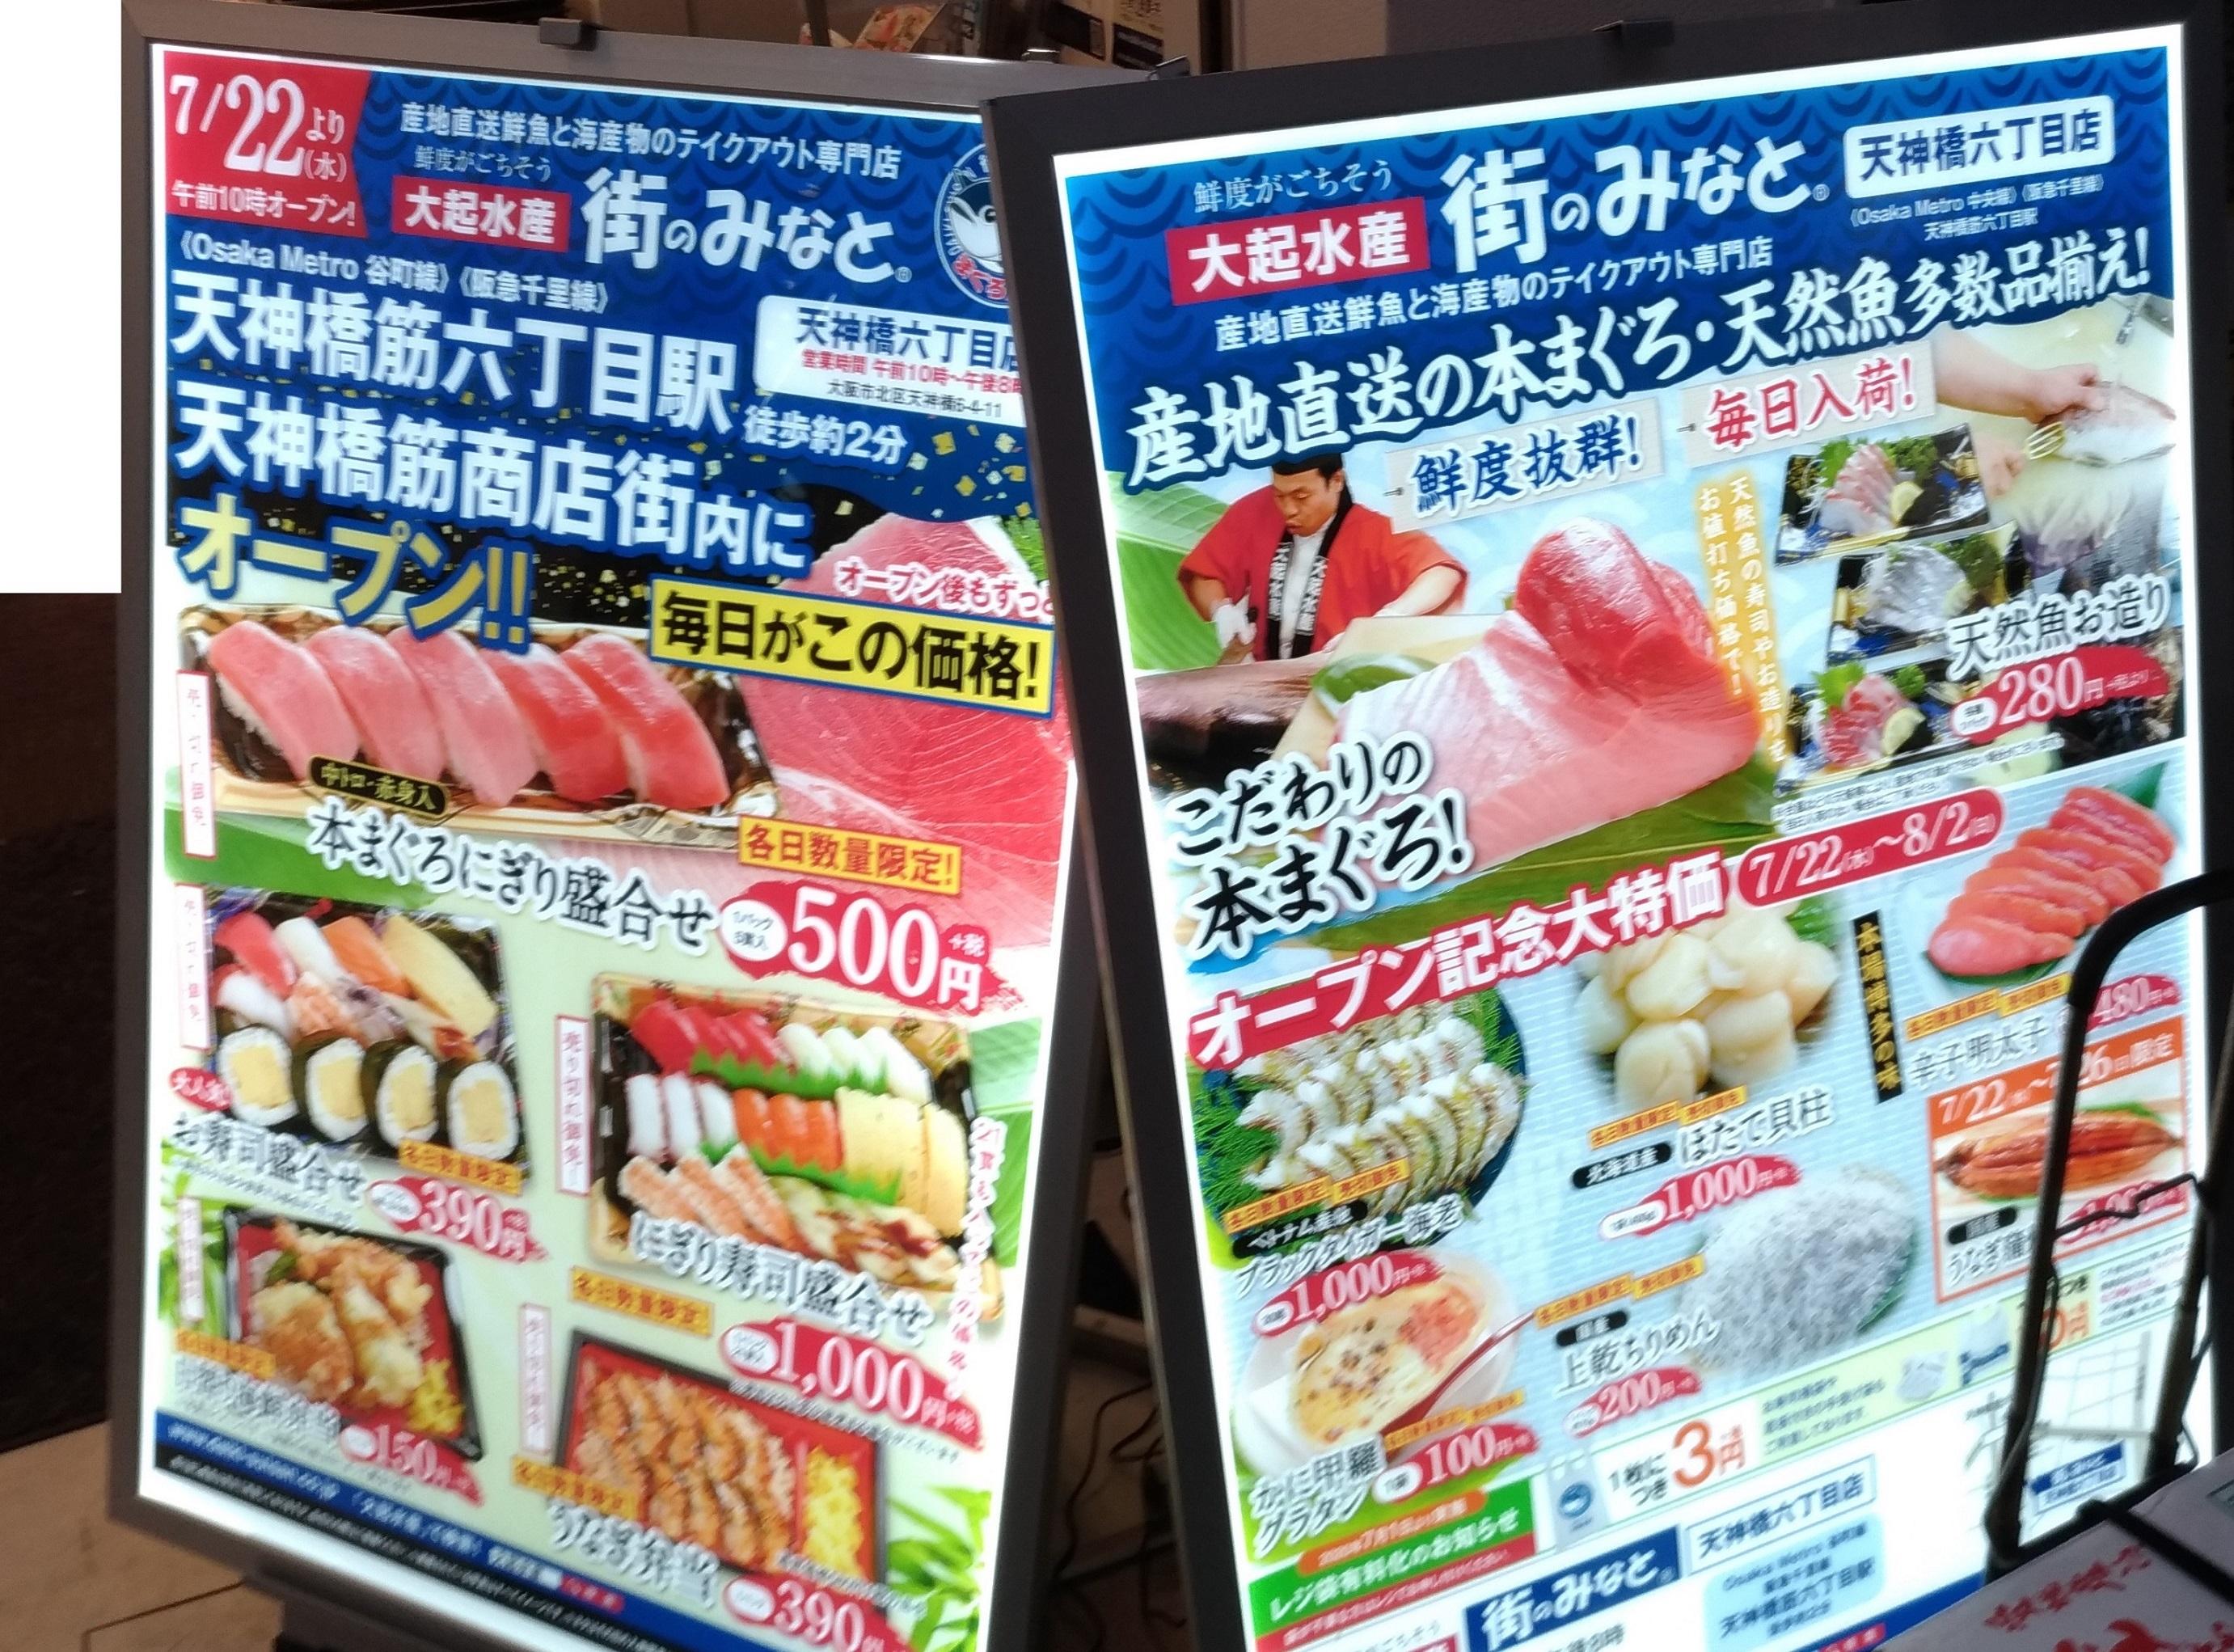 tenma_osaka_sushi_0725_1.jpg